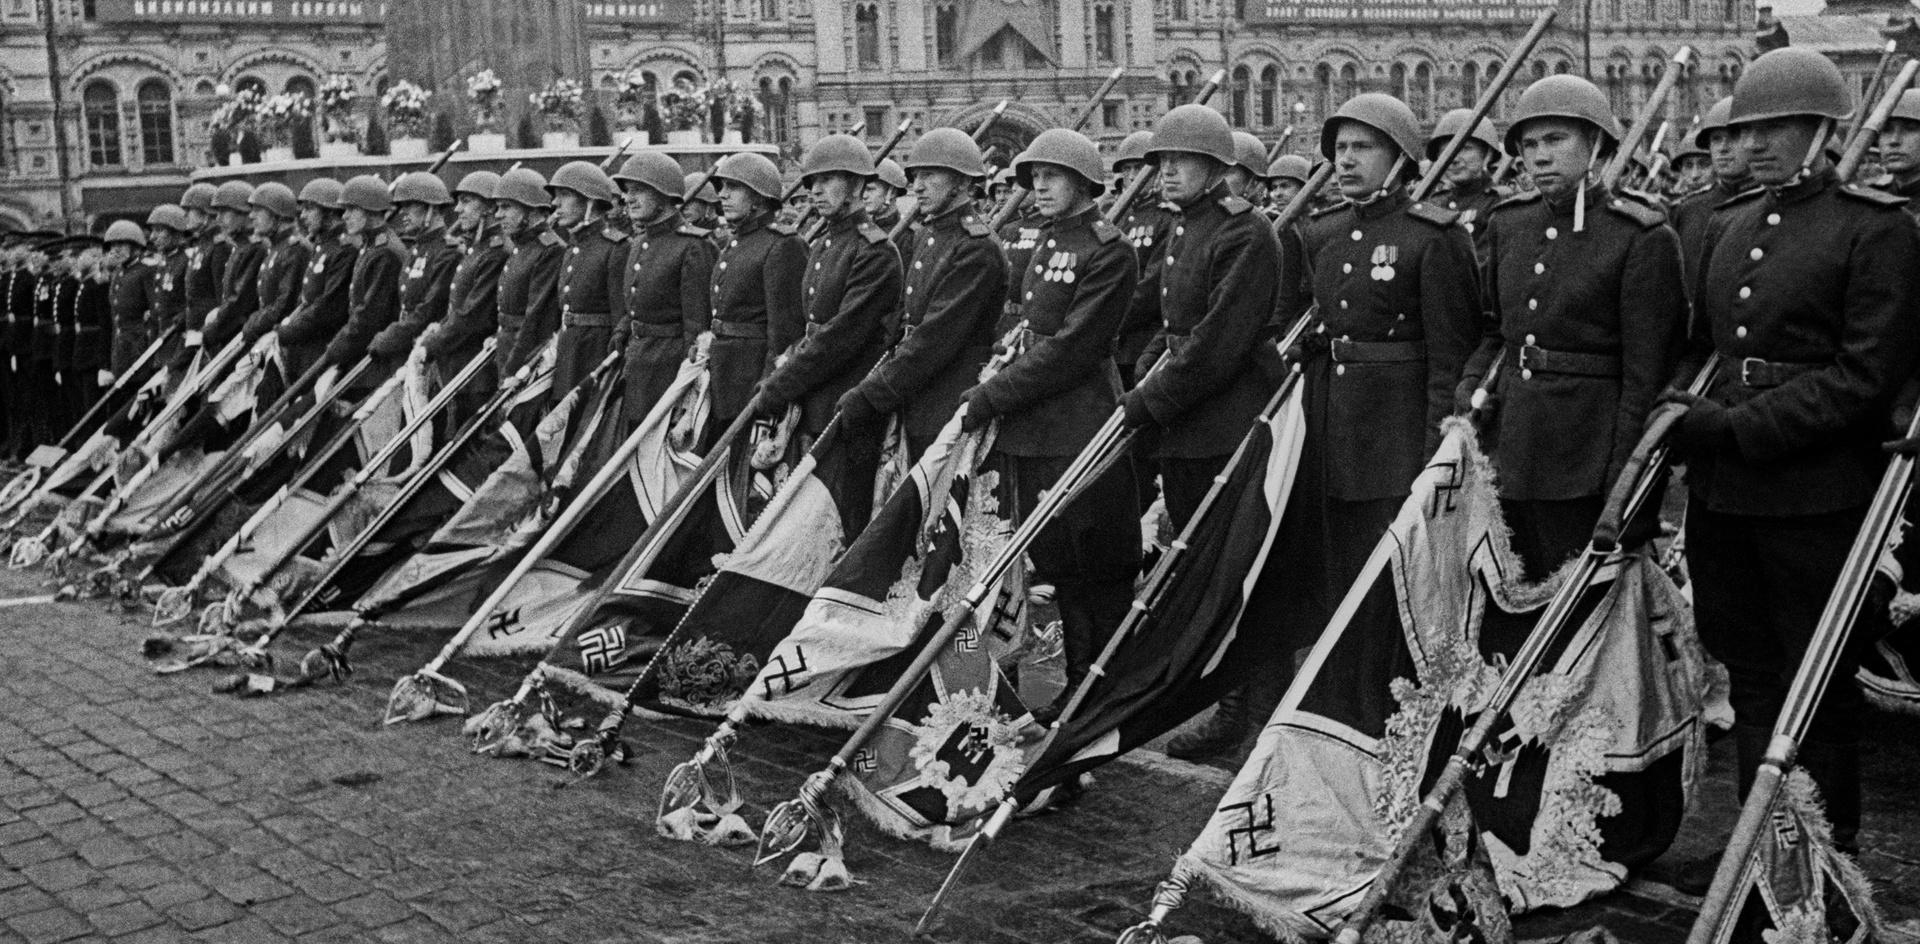 Парад Победы на Красной площади назначен на 24 июня